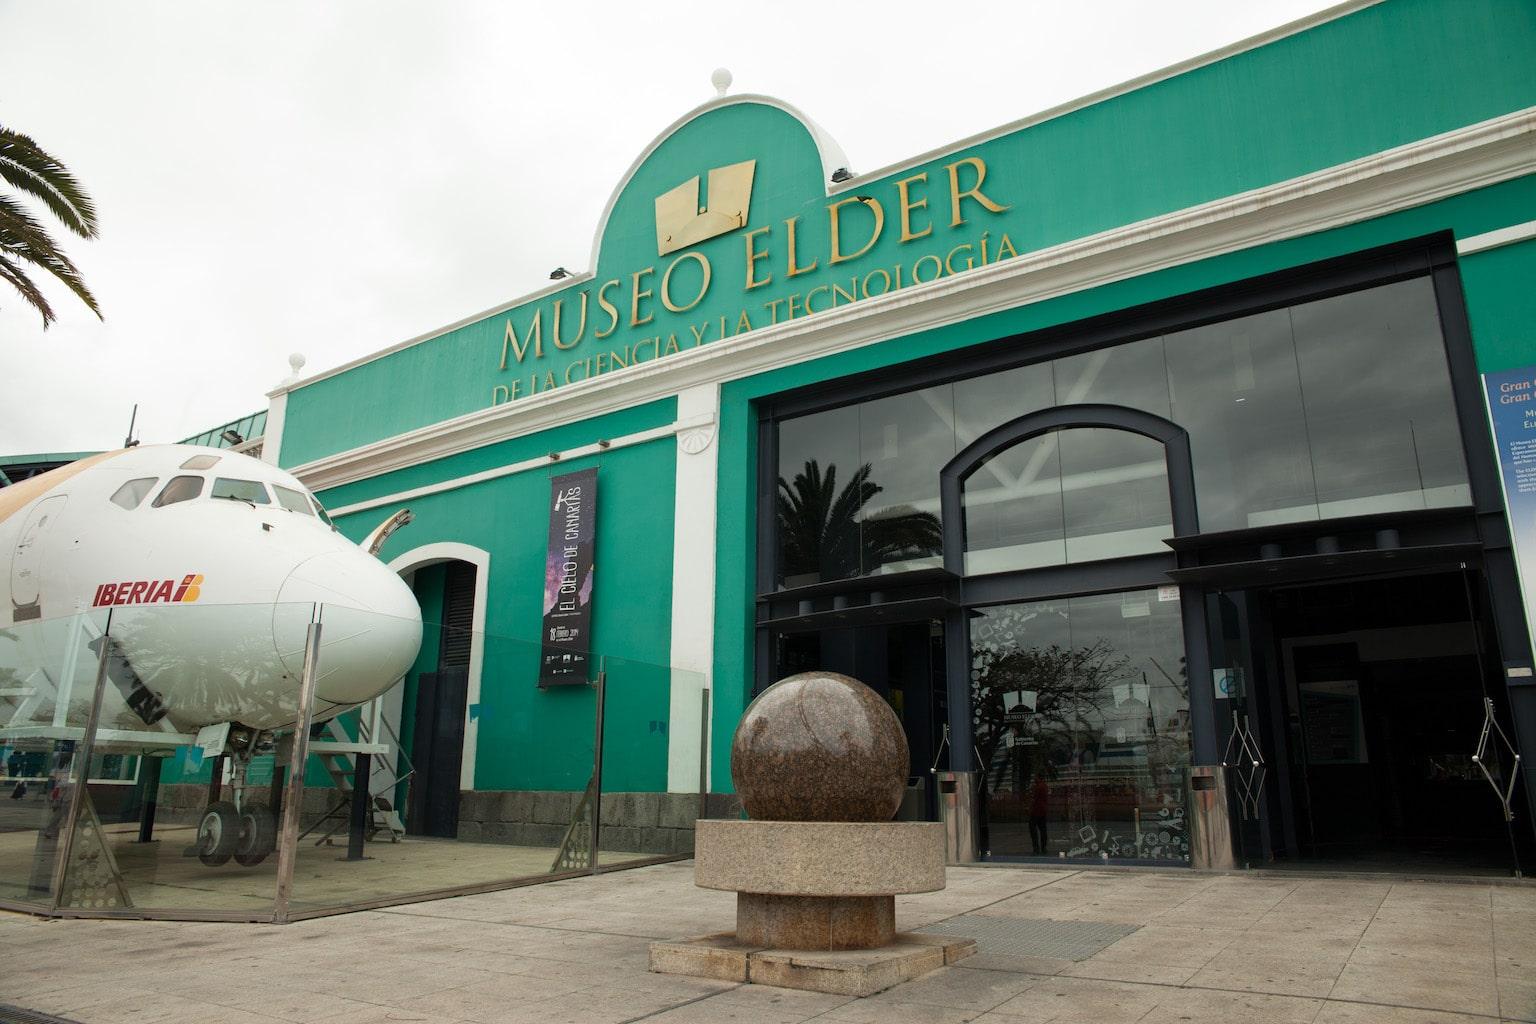 museo elder